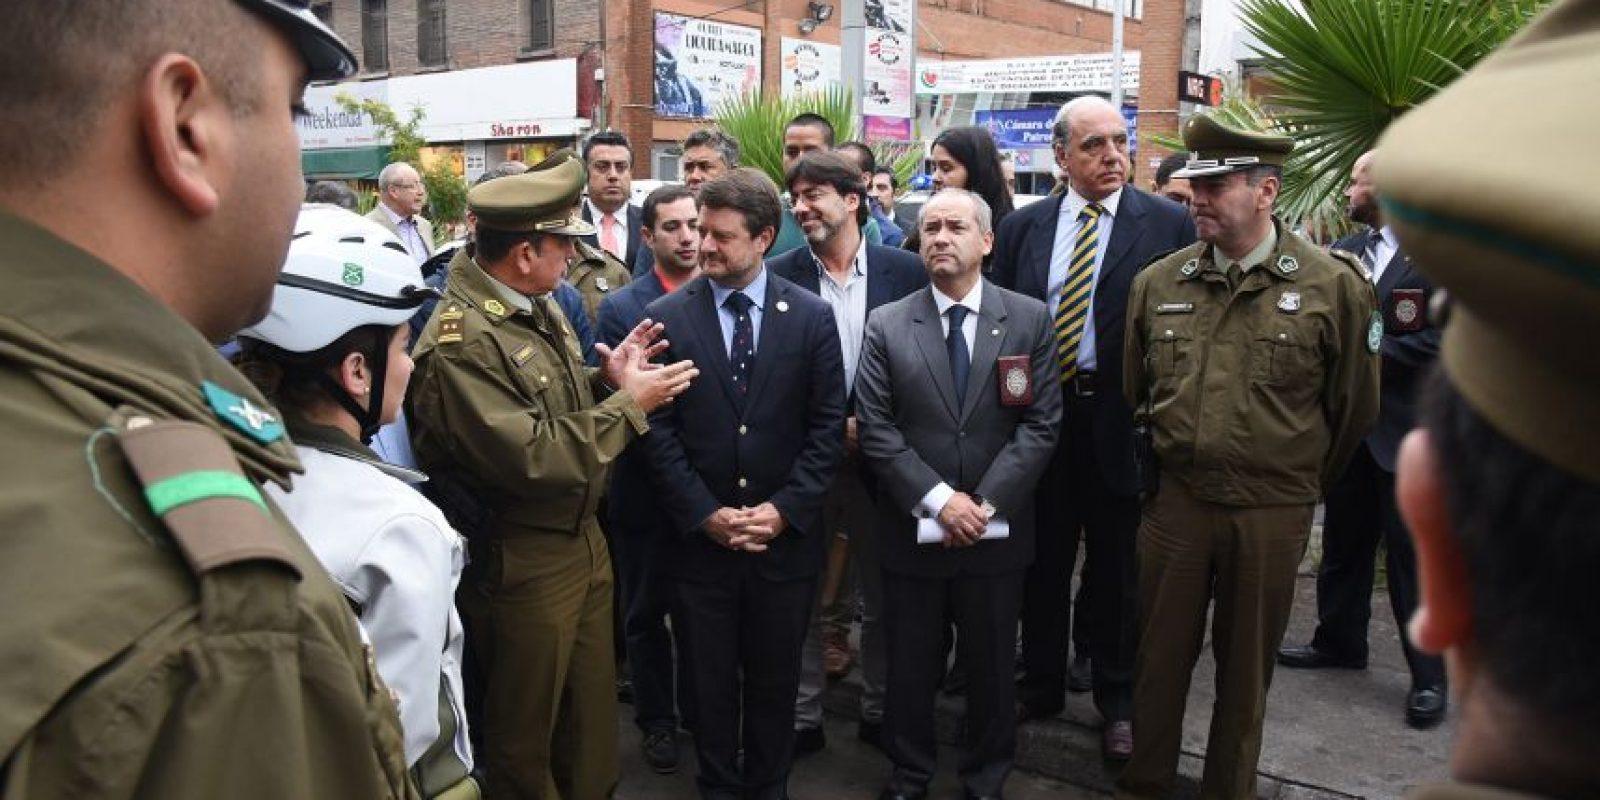 Foto:Intendencia Metropolitana. Imagen Por: